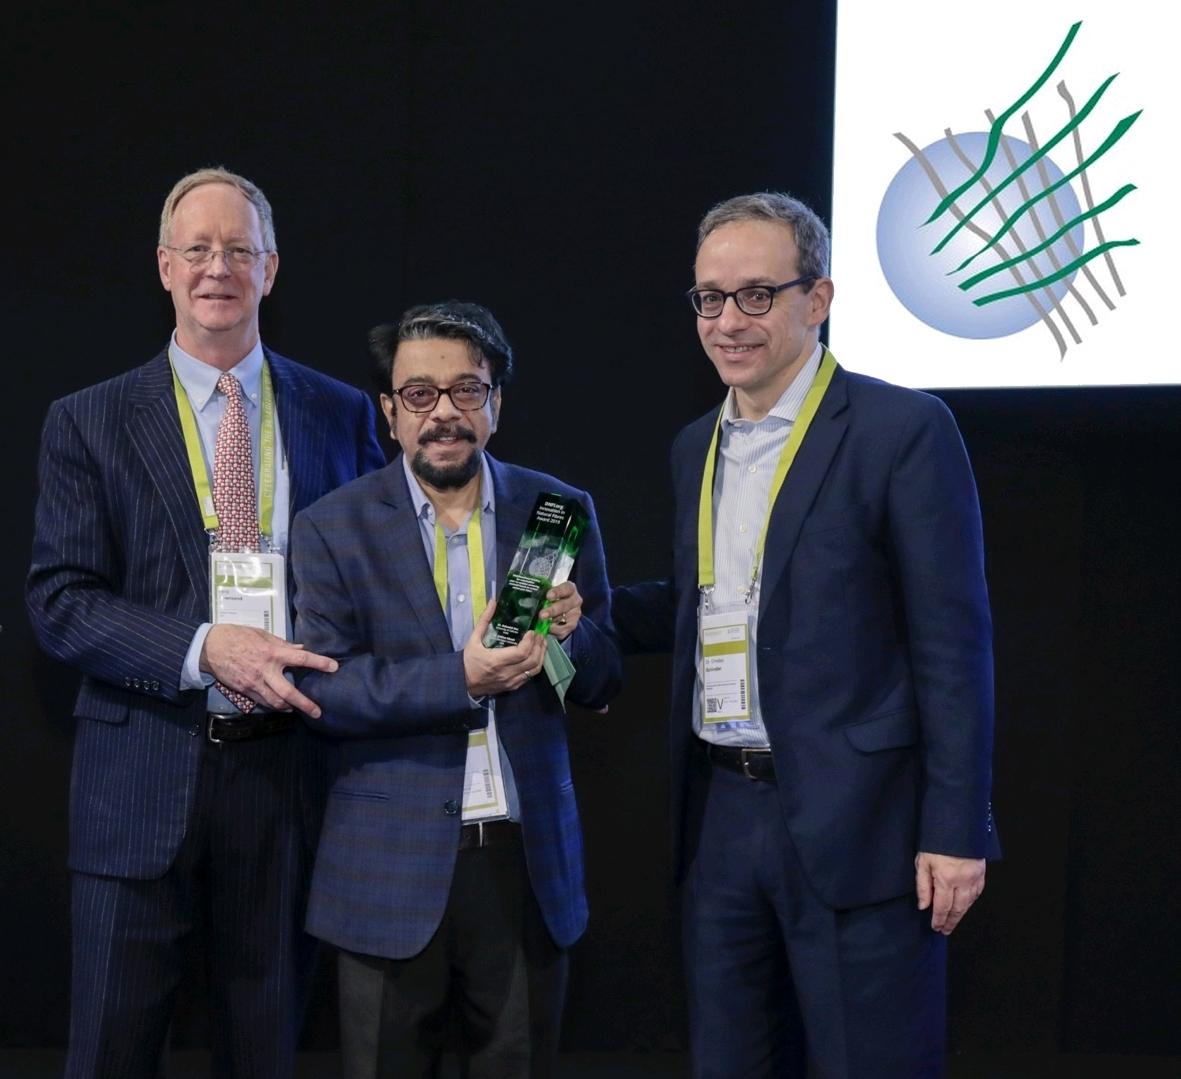 DNFI Award Ceremony